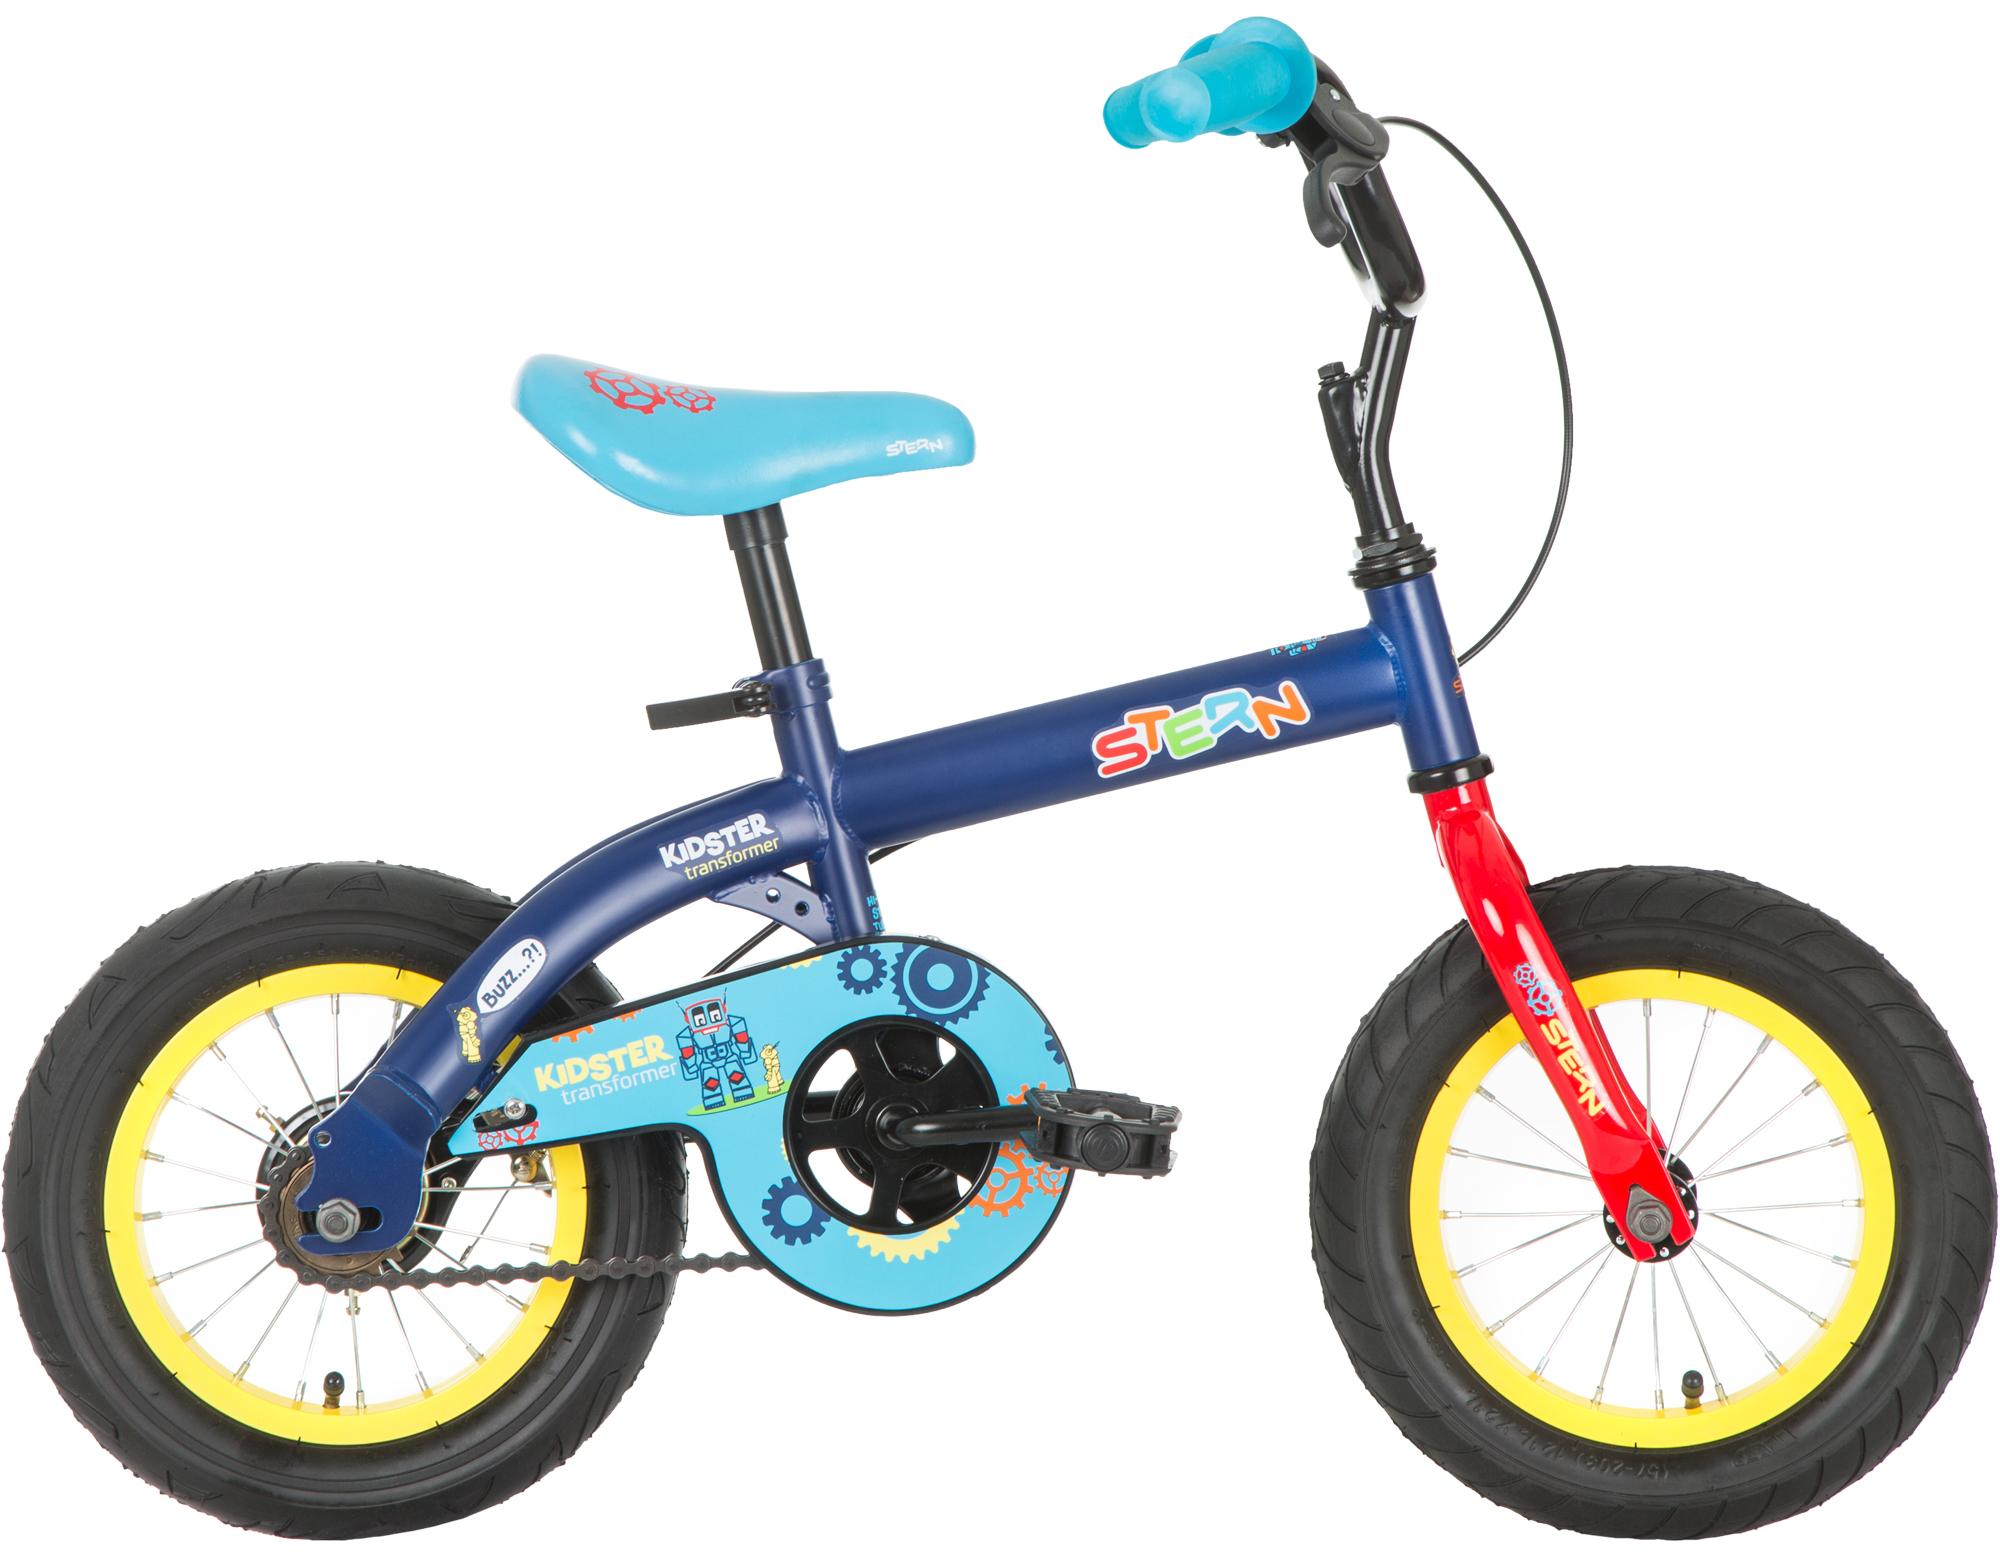 Stern Велосипед детский Stern Kidster Transformer 12 купить японский детский велосипед в хабаровске